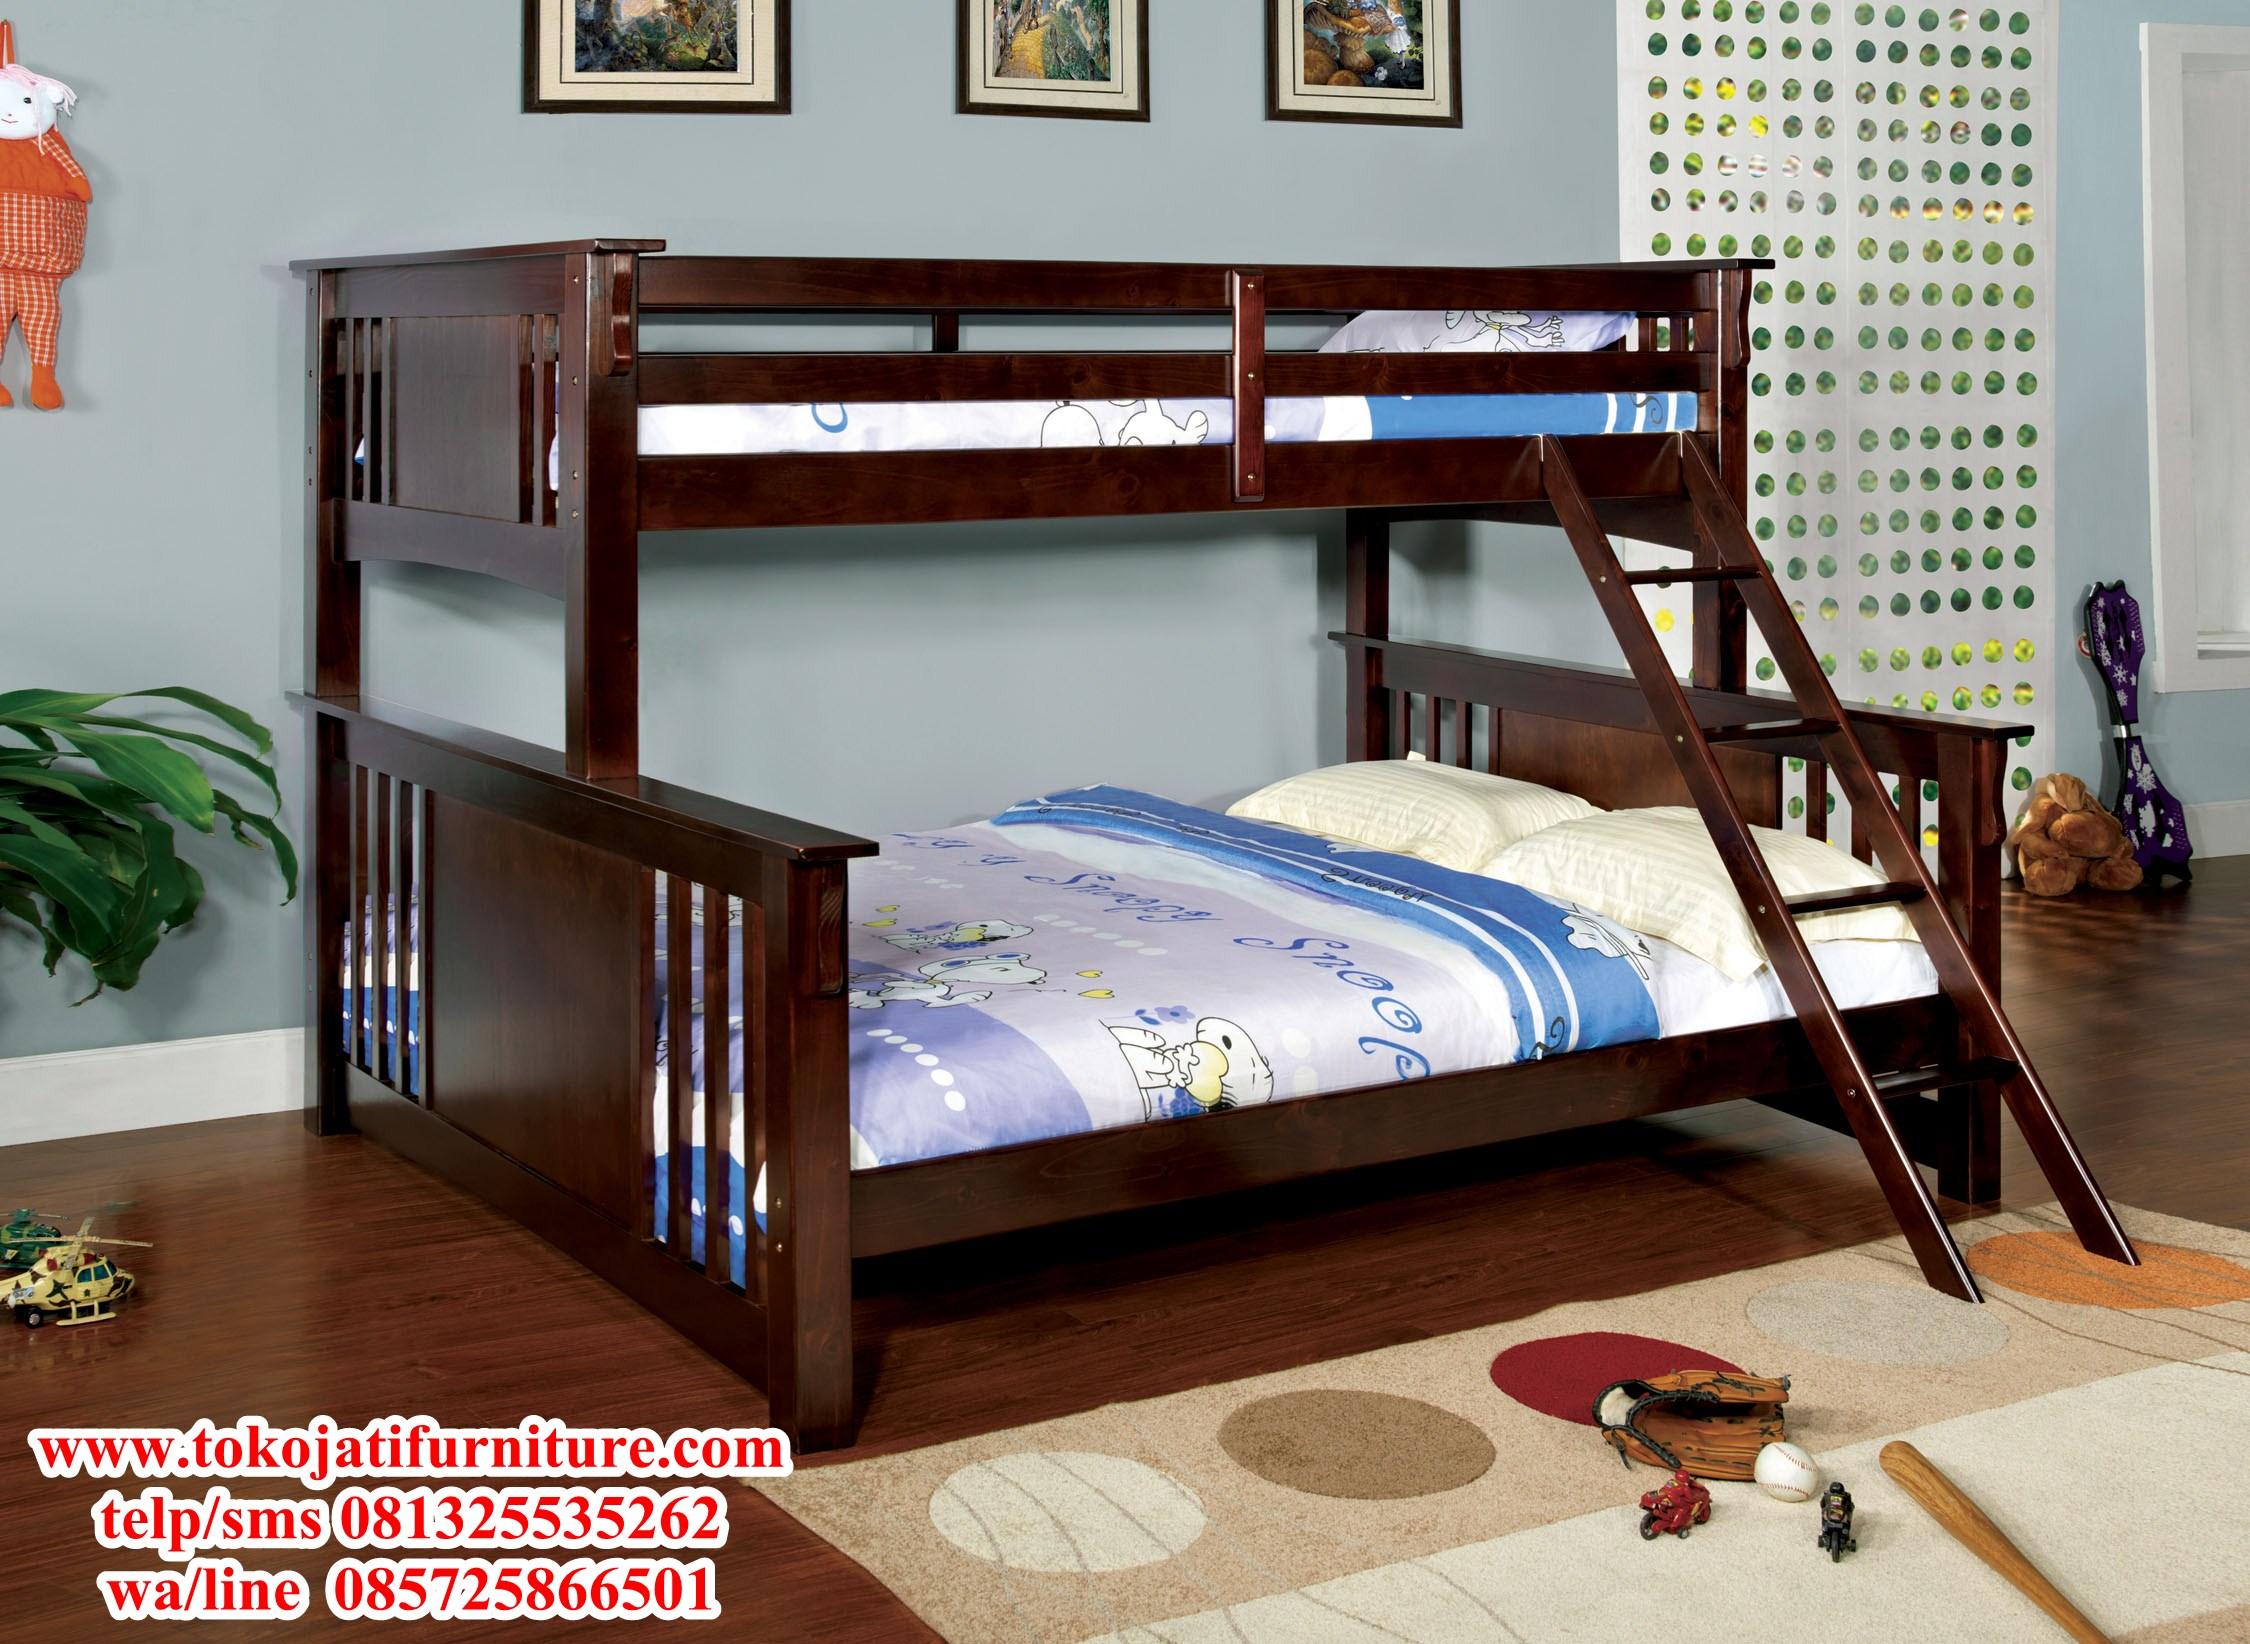 tempat-tidur-tingkat-jati-minimalis tempat tidur tingkat jati minimalis